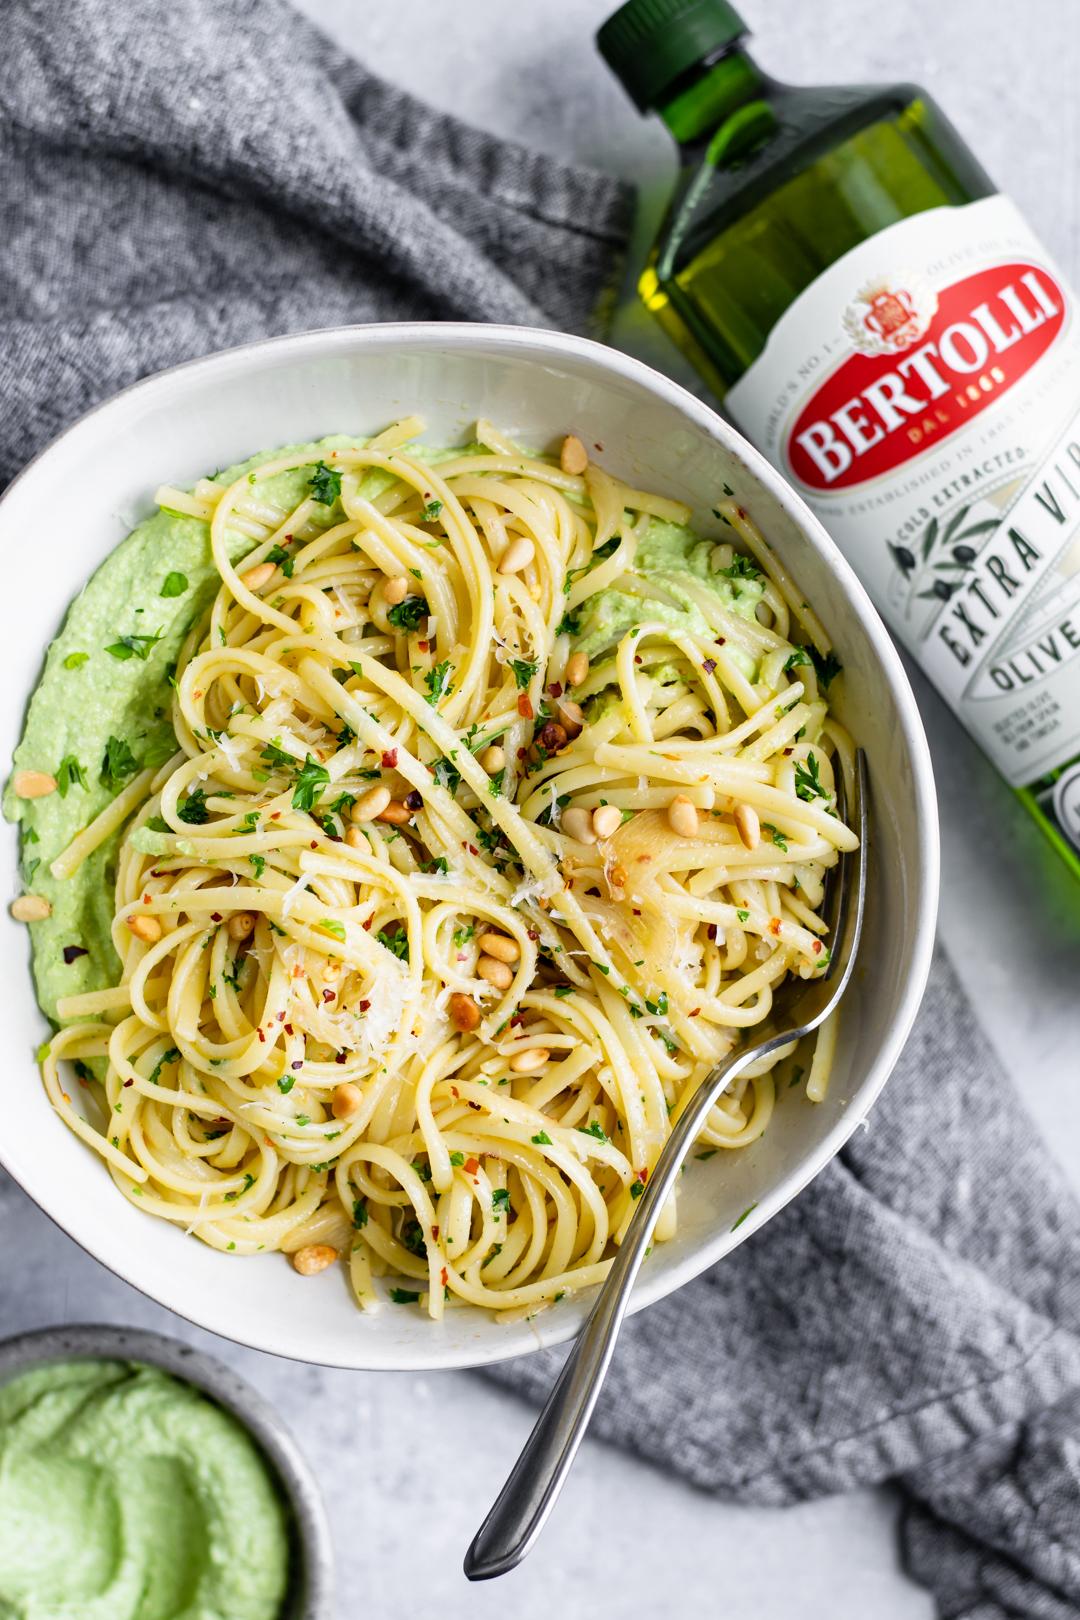 Vegan Whipped Pea Ricotta with Bertolli Olive Oil